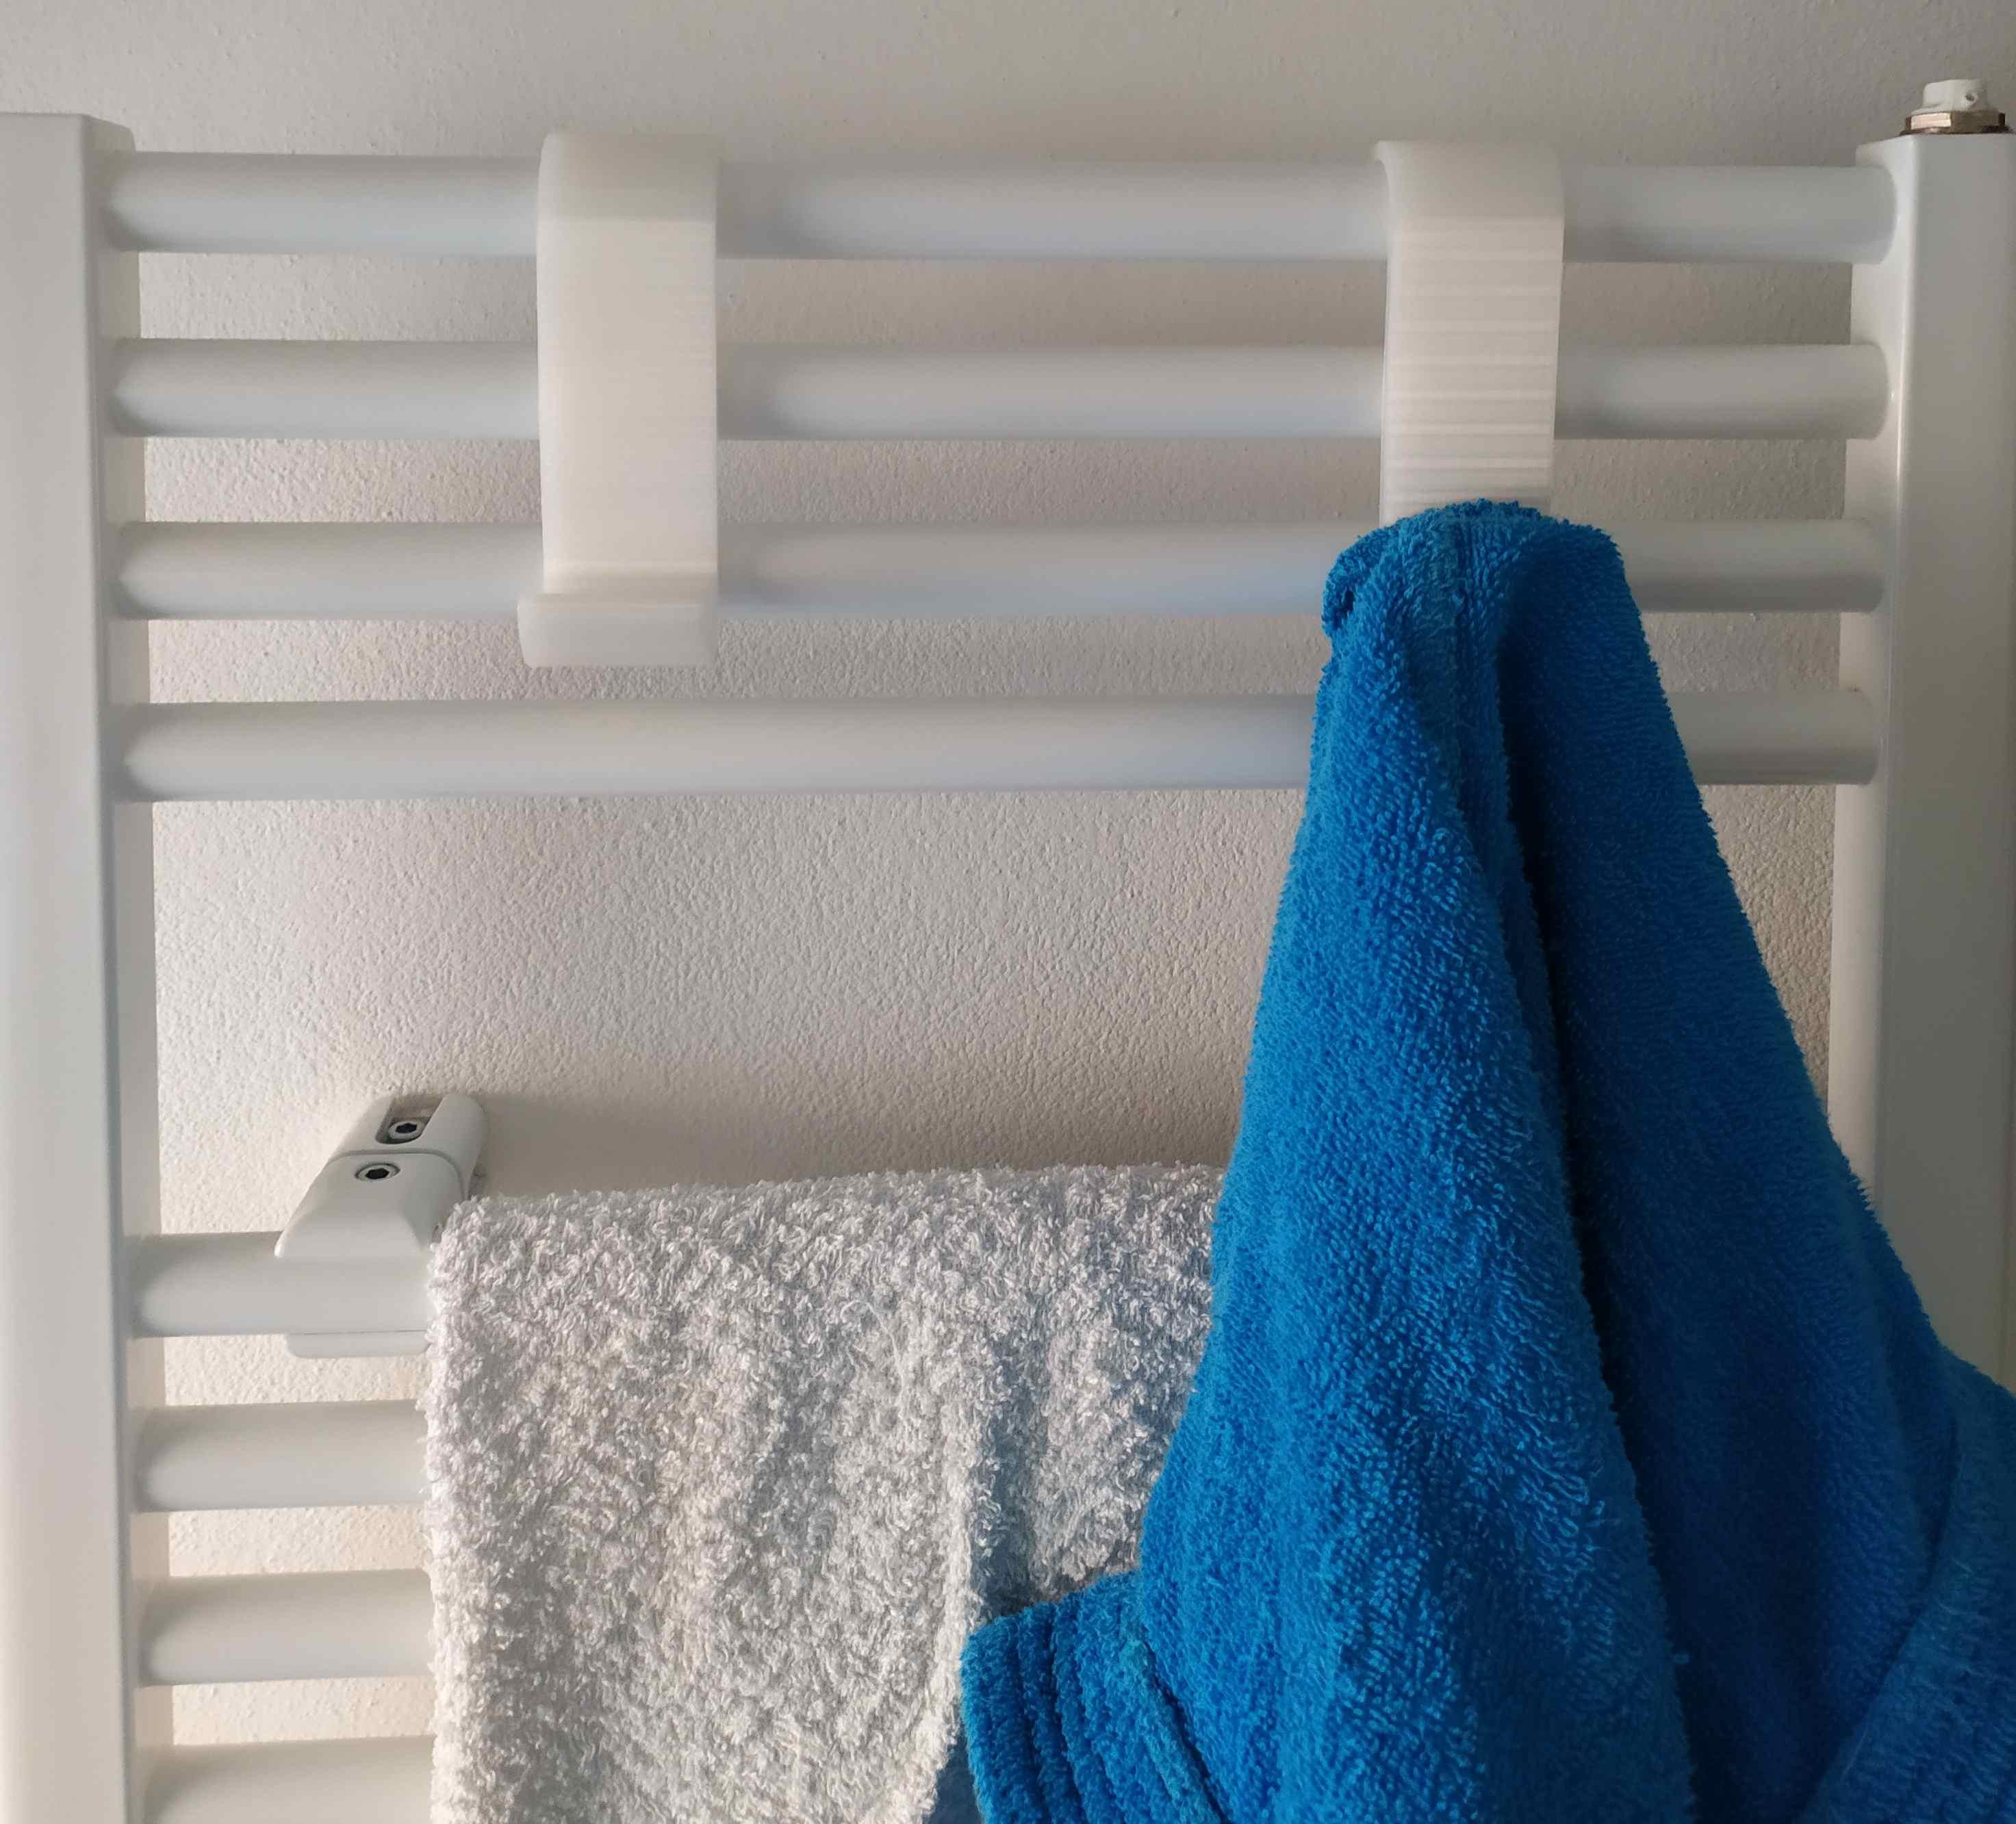 hook for radiator to hang bathrobe